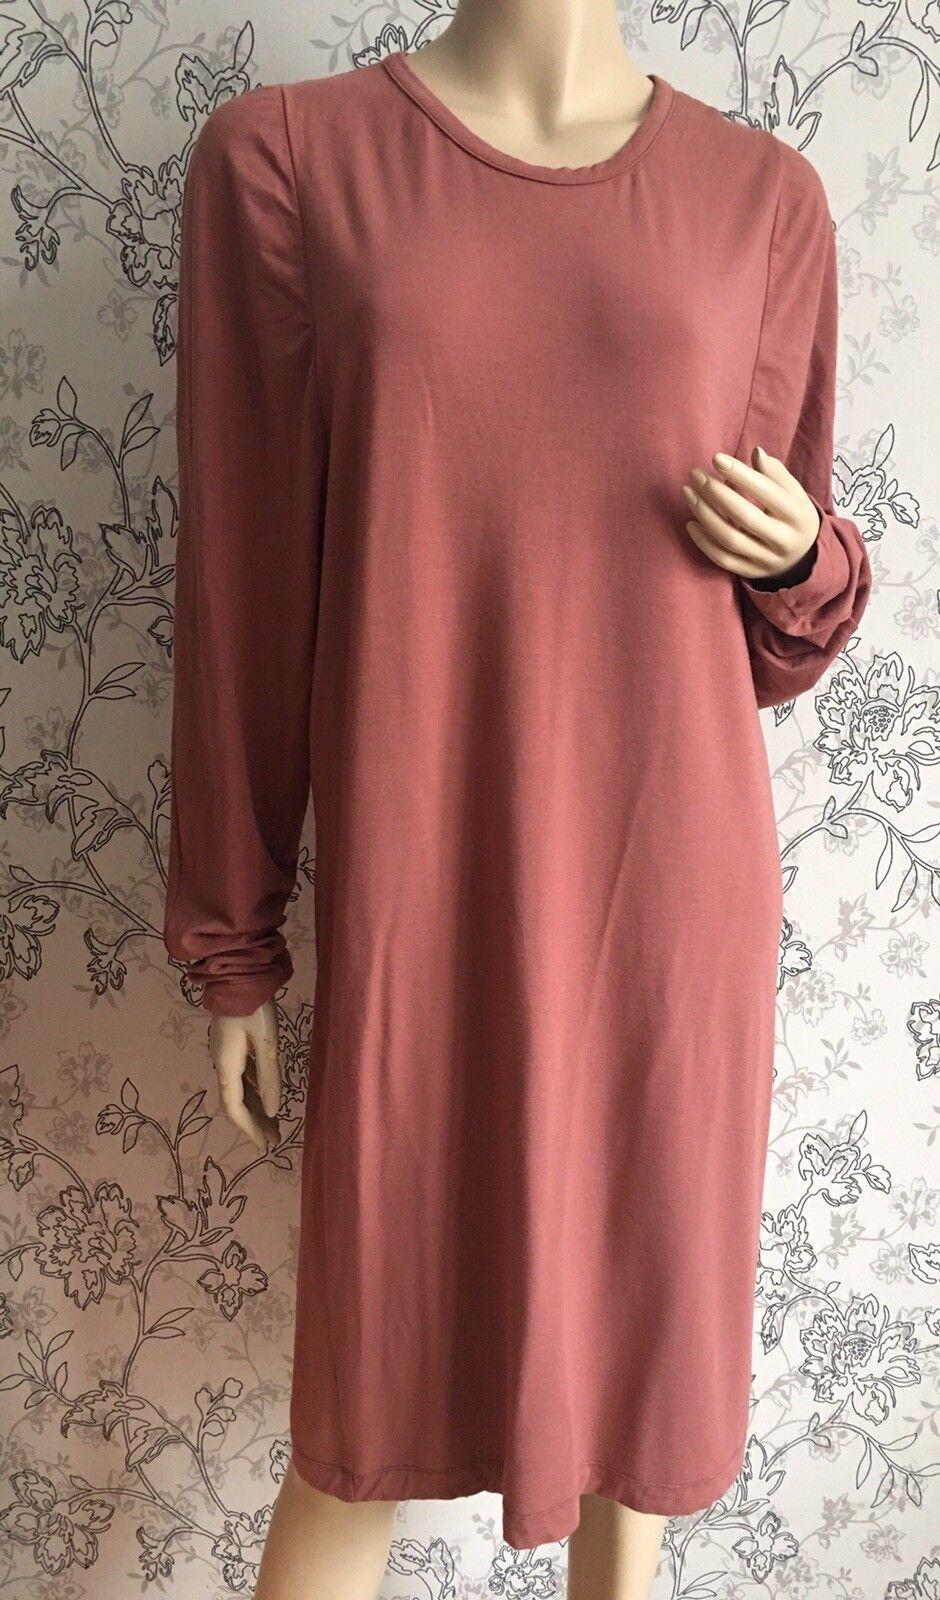 MAISON MARTIN MARGIELA 1 Wool Blend Long Sleeve Dress sz IT 46 EUC